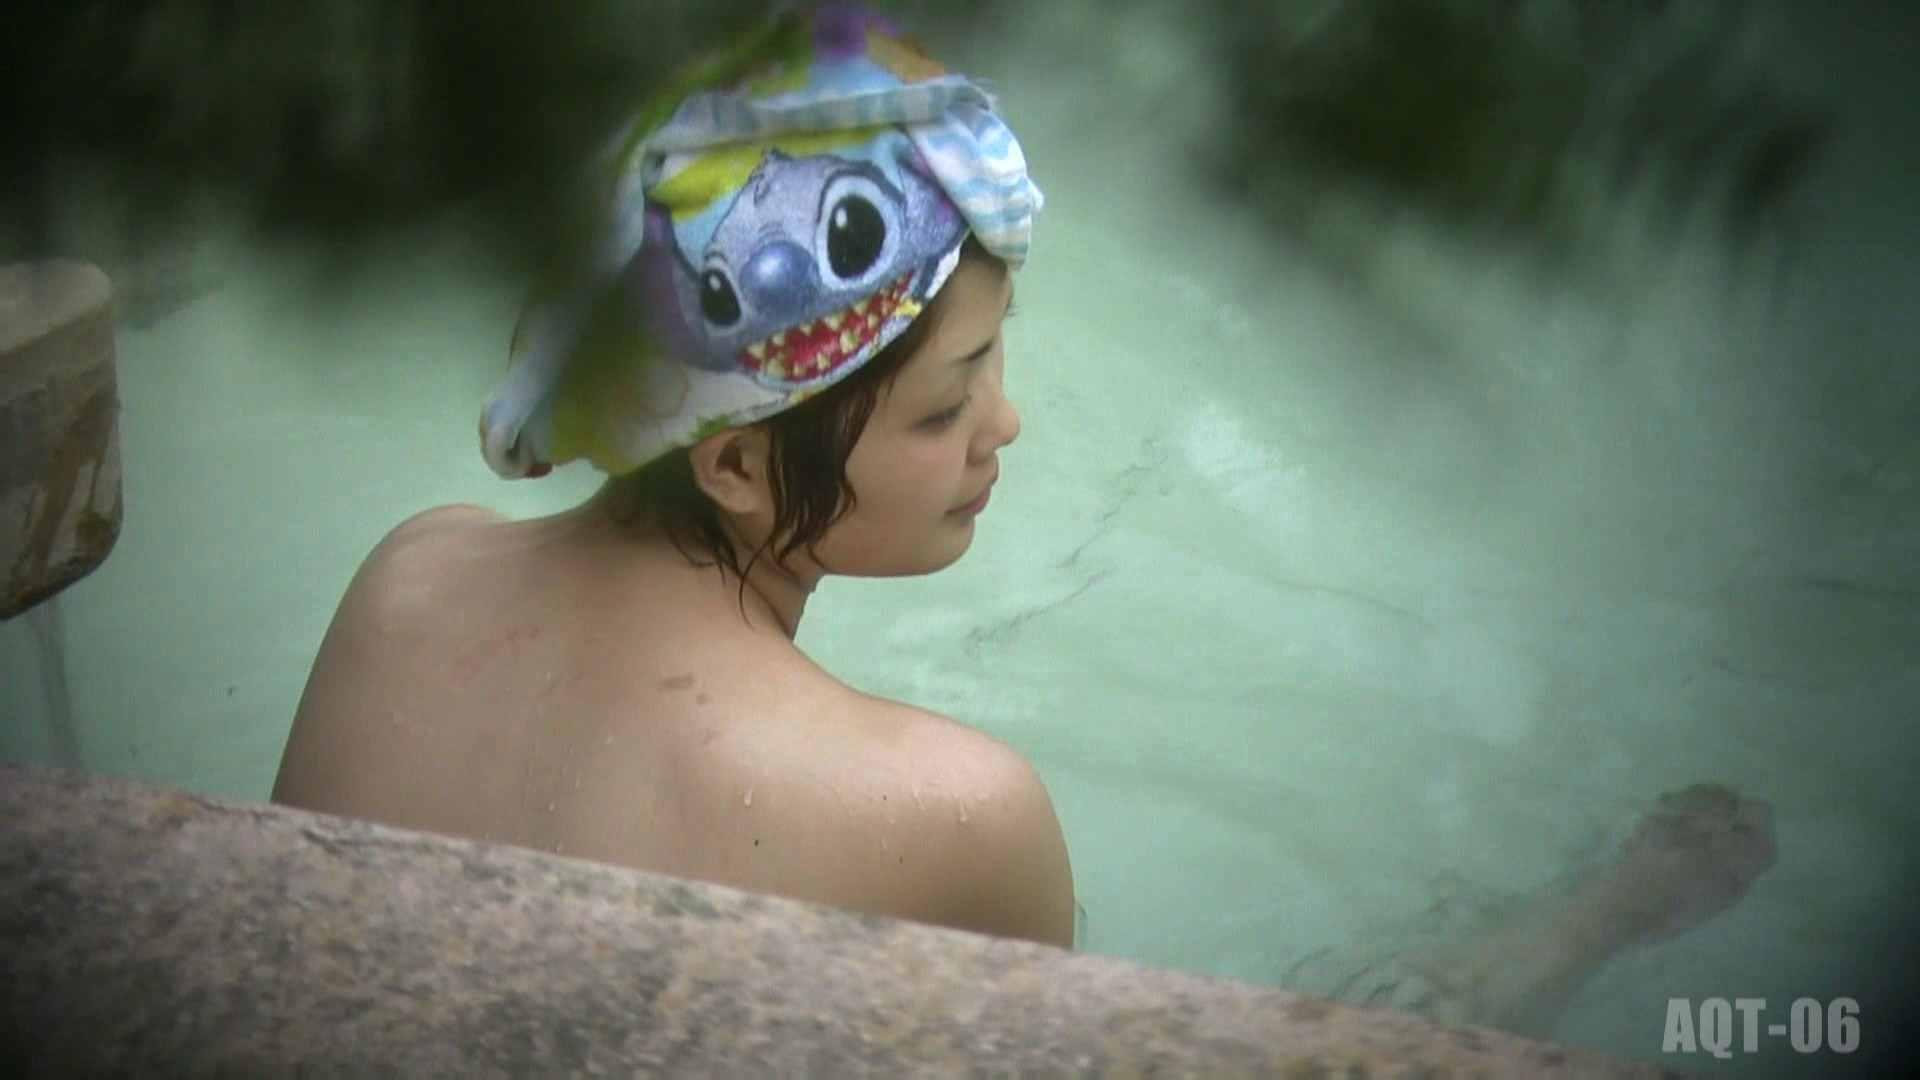 Aquaな露天風呂Vol.761 OLのエロ生活   露天風呂  97連発 91